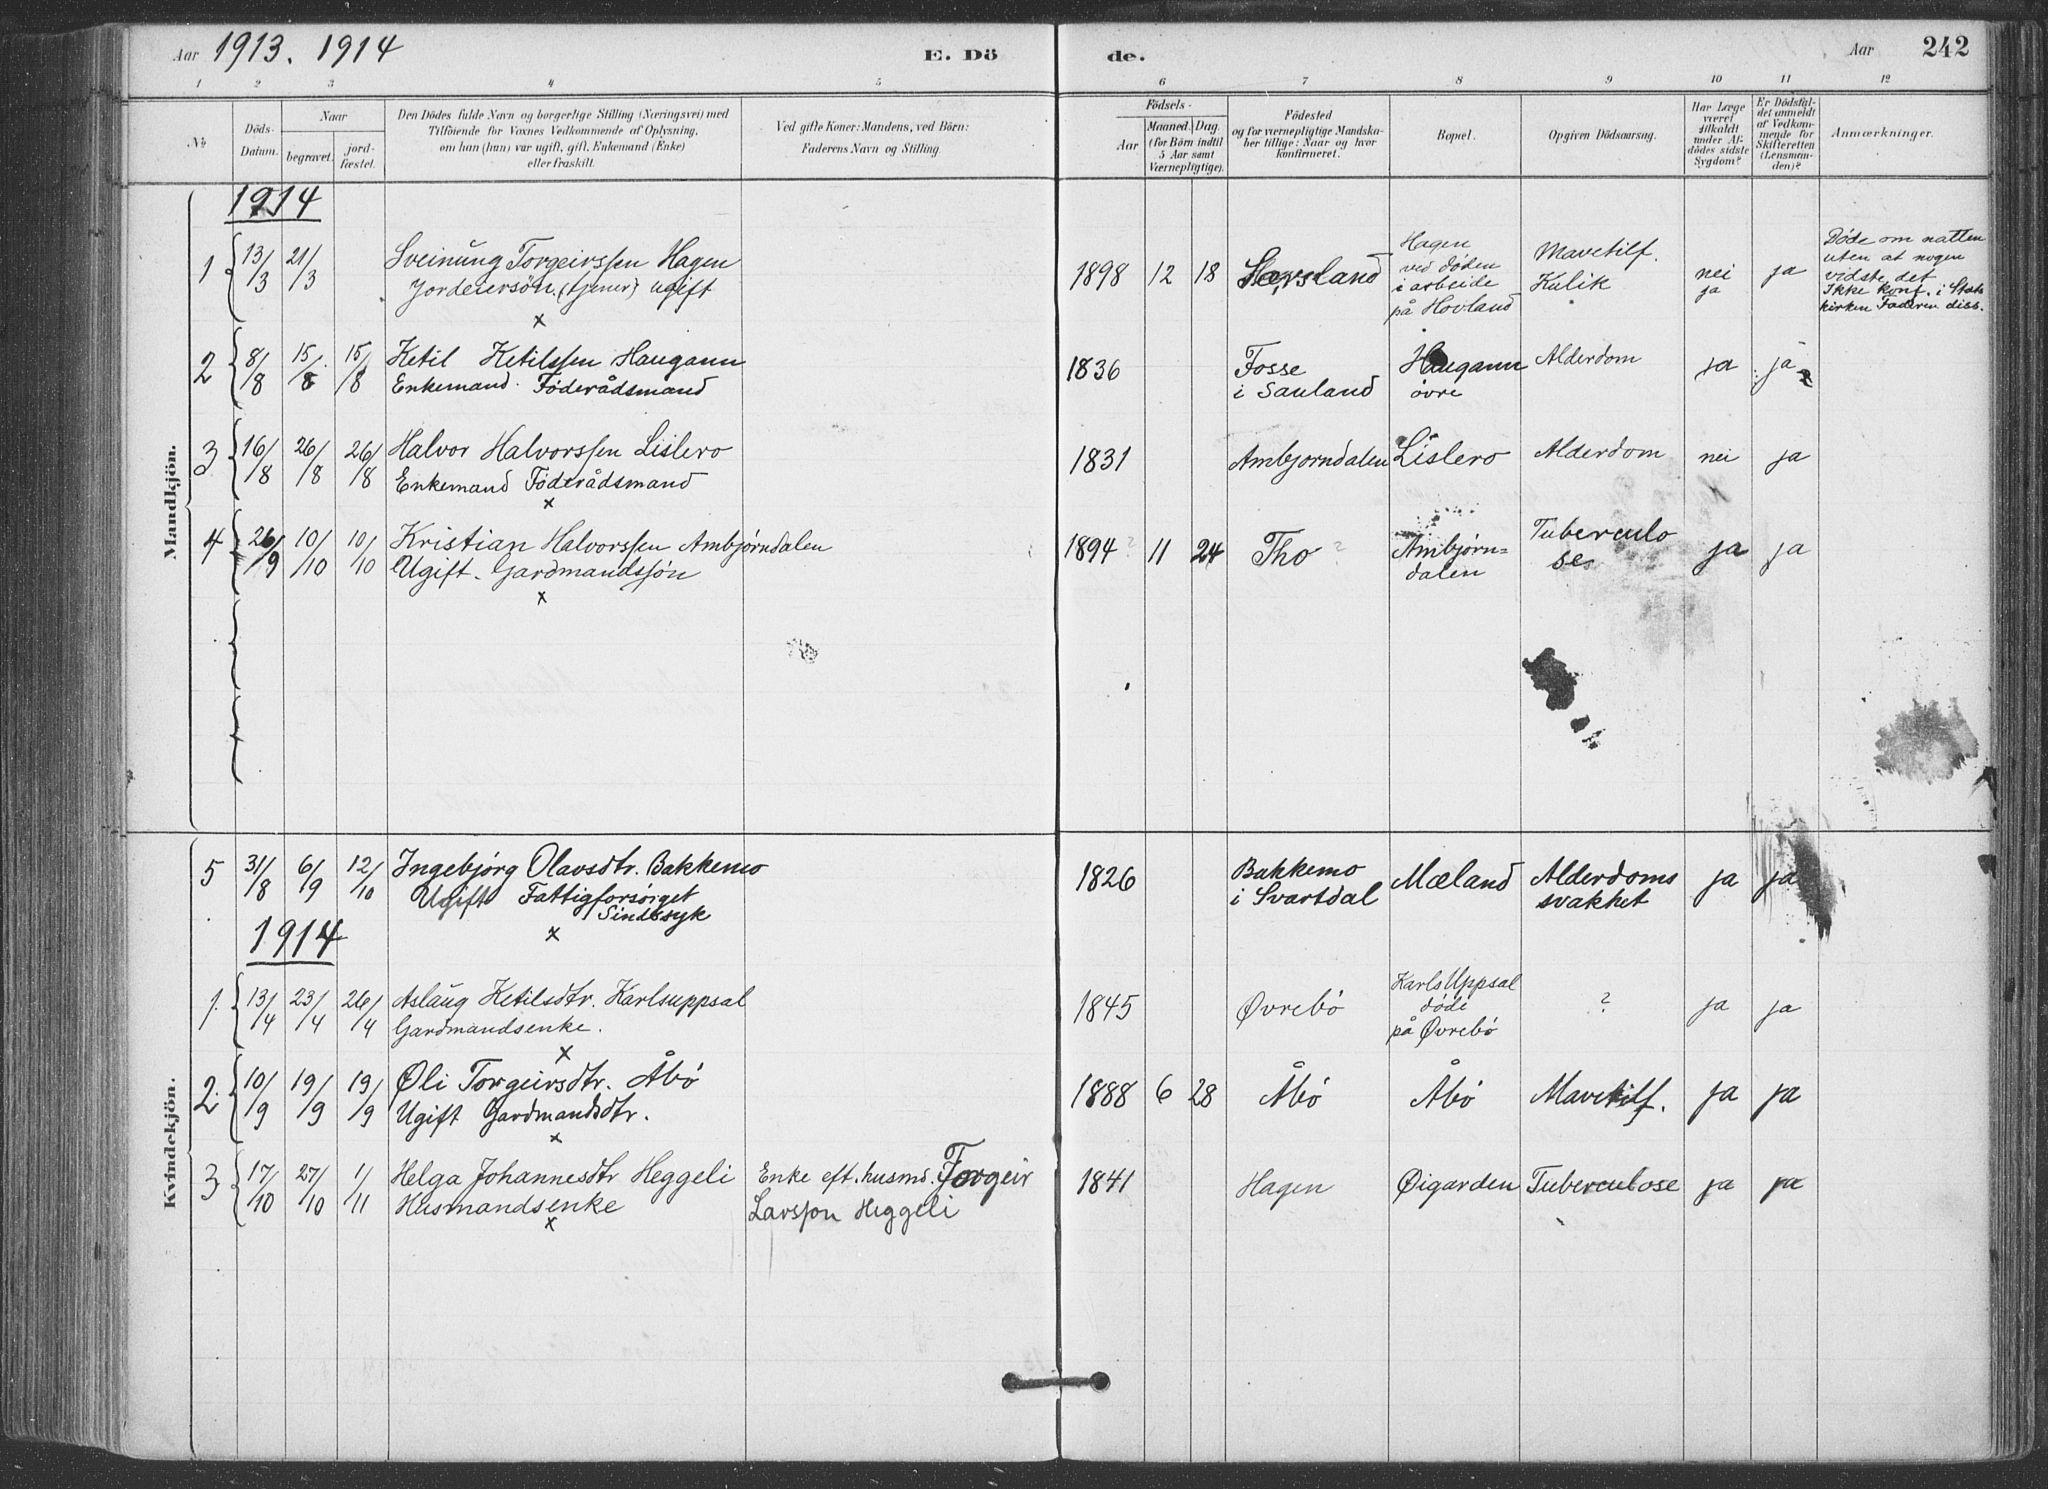 SAKO, Hjartdal kirkebøker, F/Fa/L0010: Ministerialbok nr. I 10, 1880-1929, s. 242